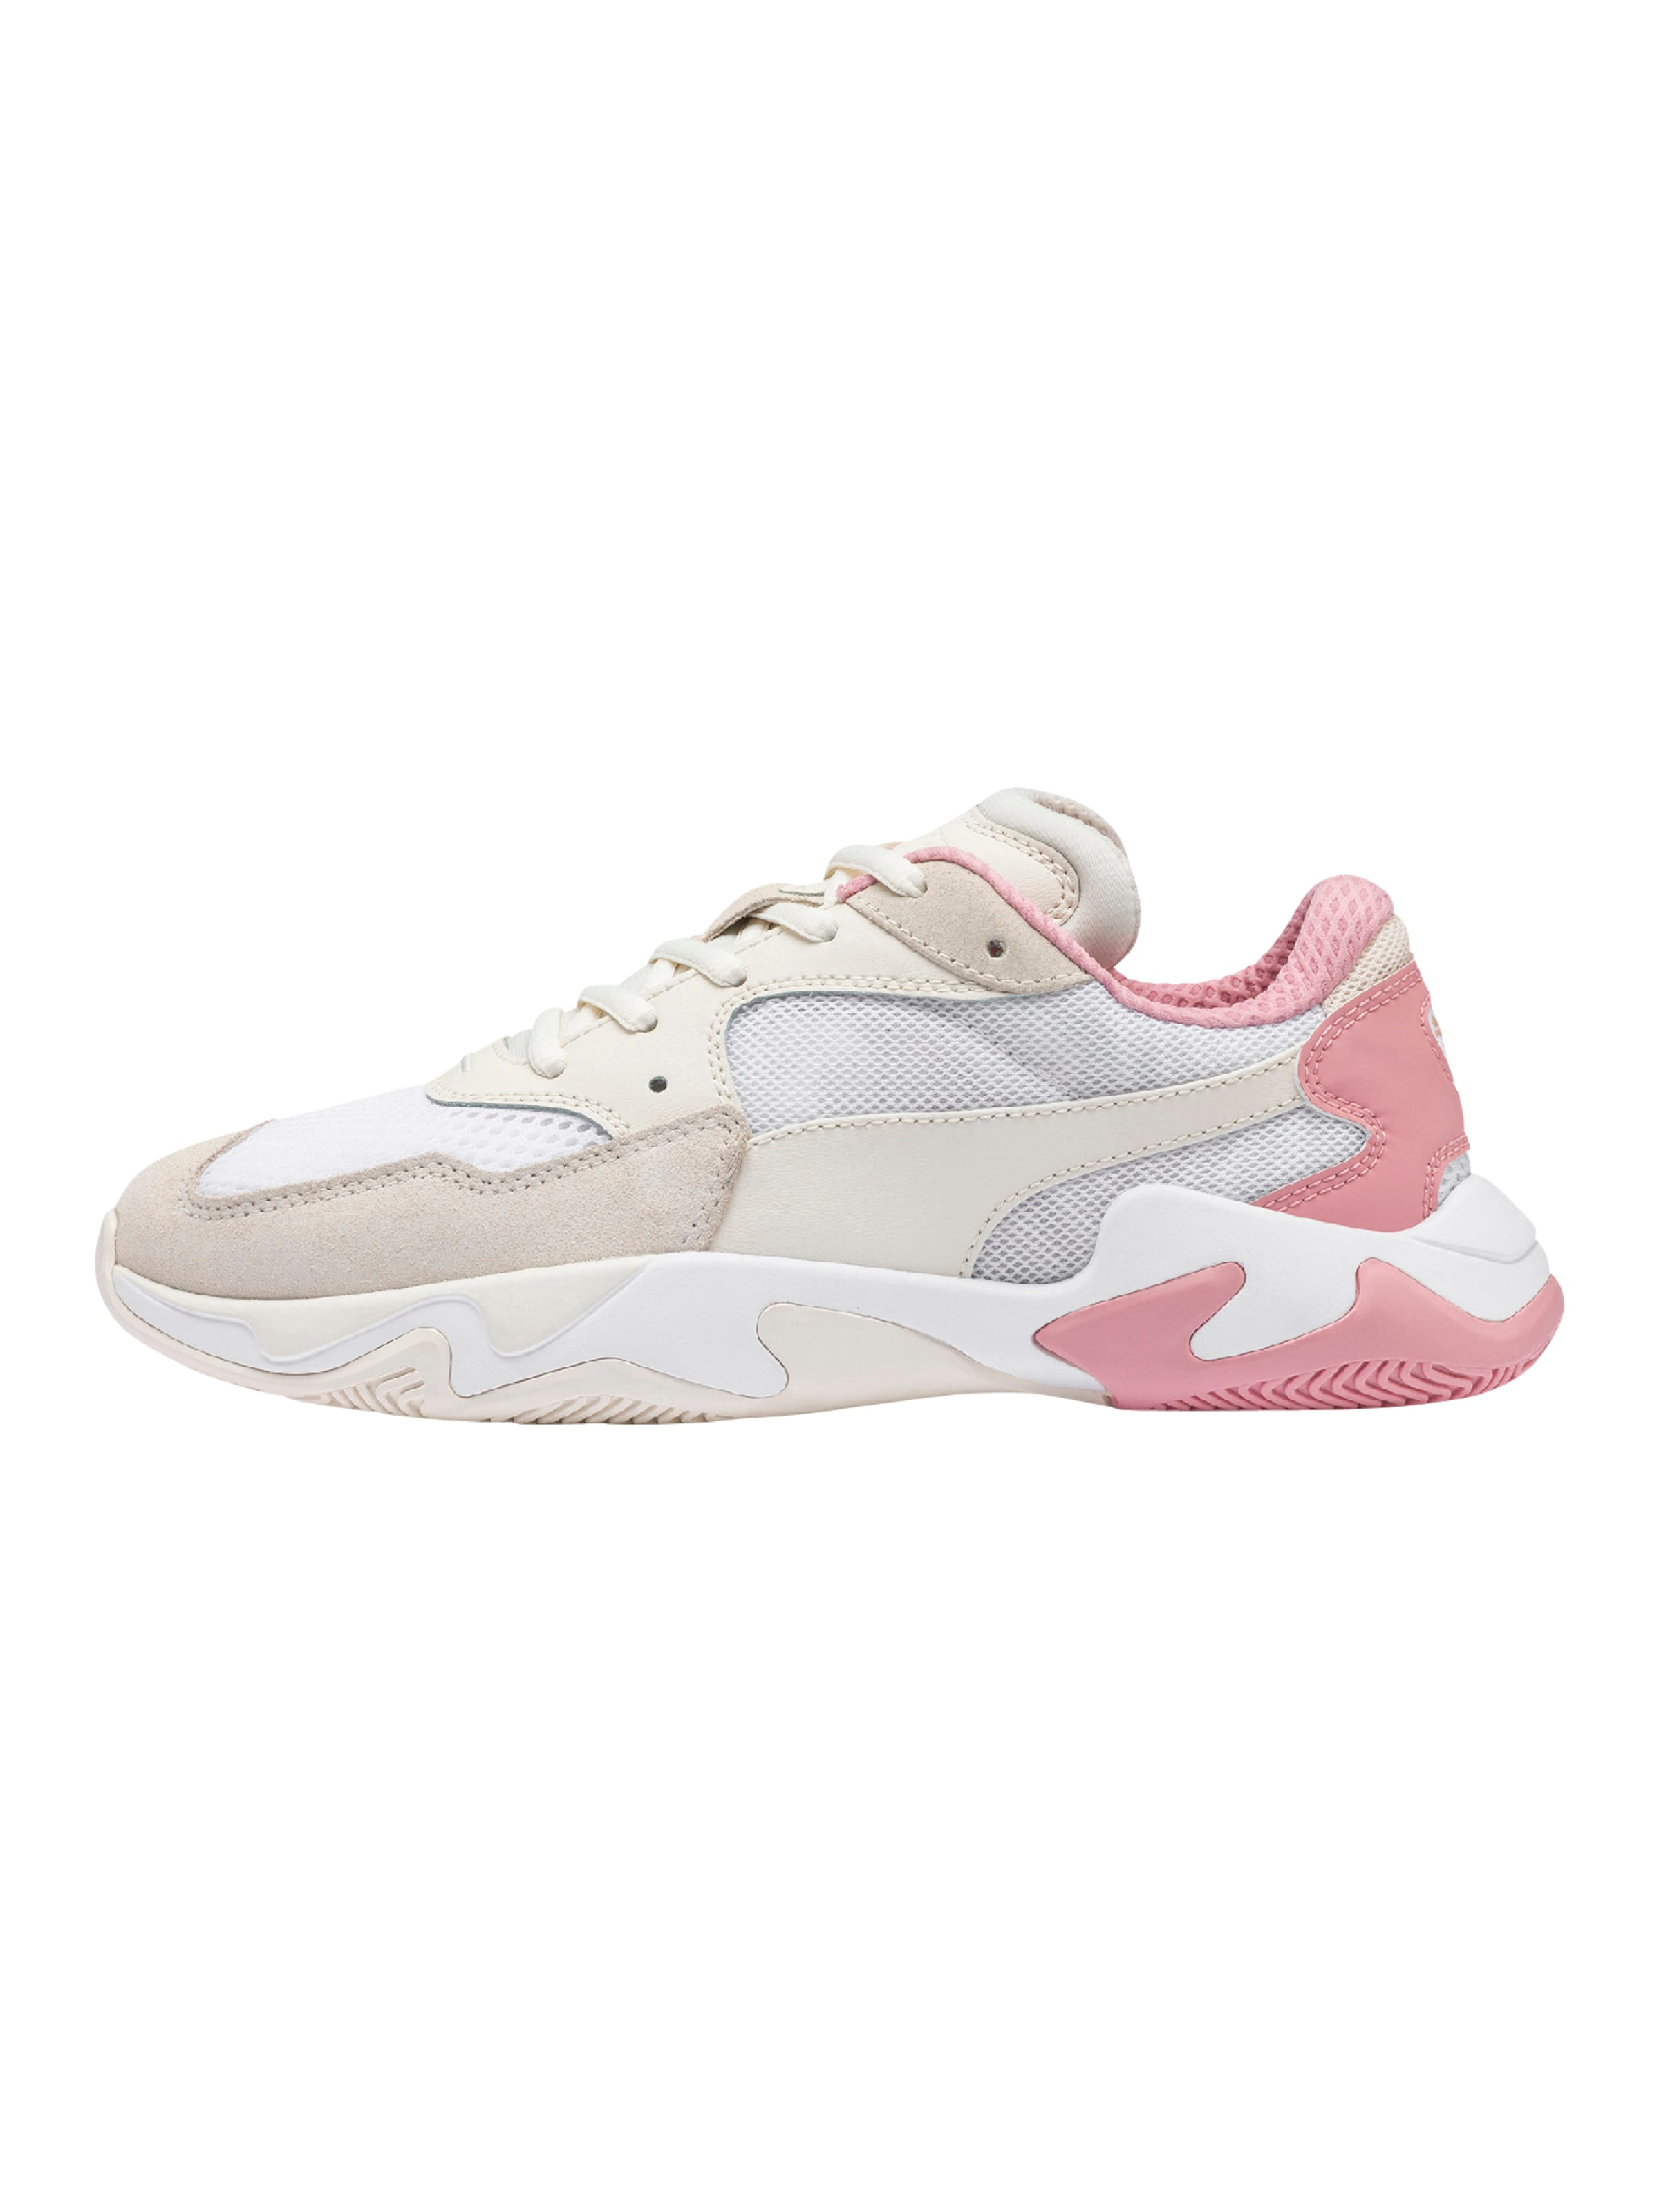 Origin' In Weiß BeigeAltrosa 'storm Puma Sneaker K1lFJc